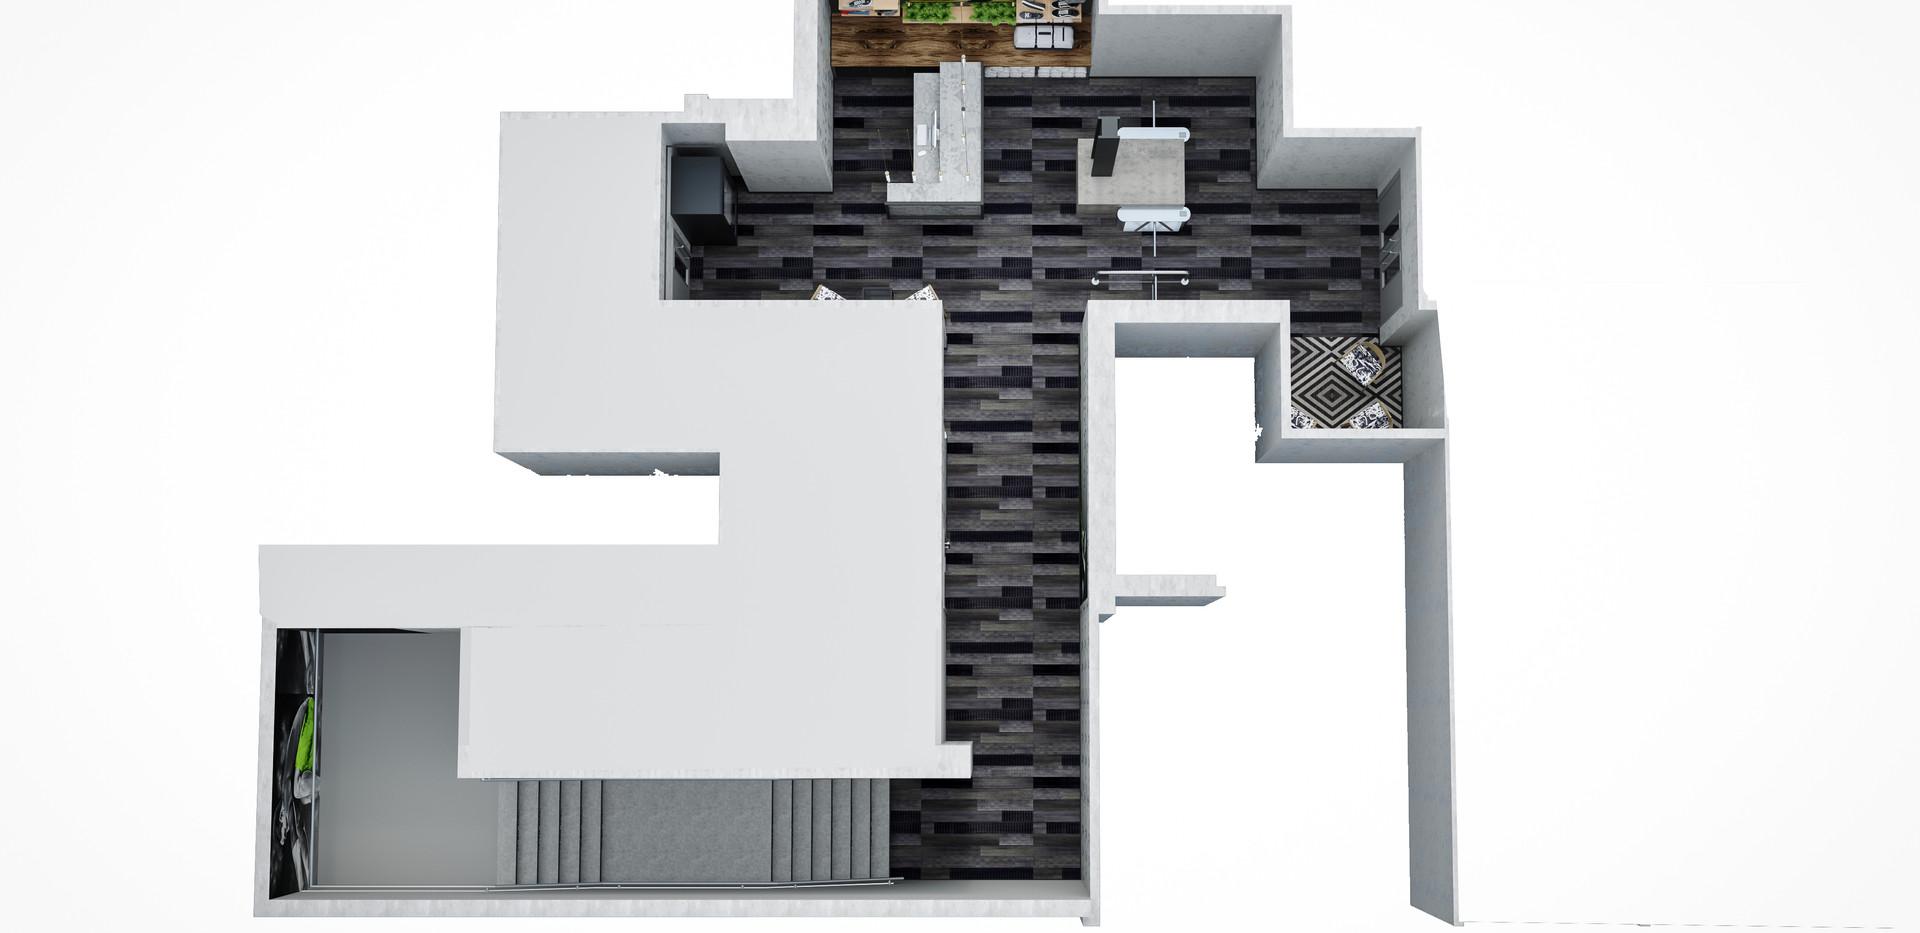 Space plan Ground floor